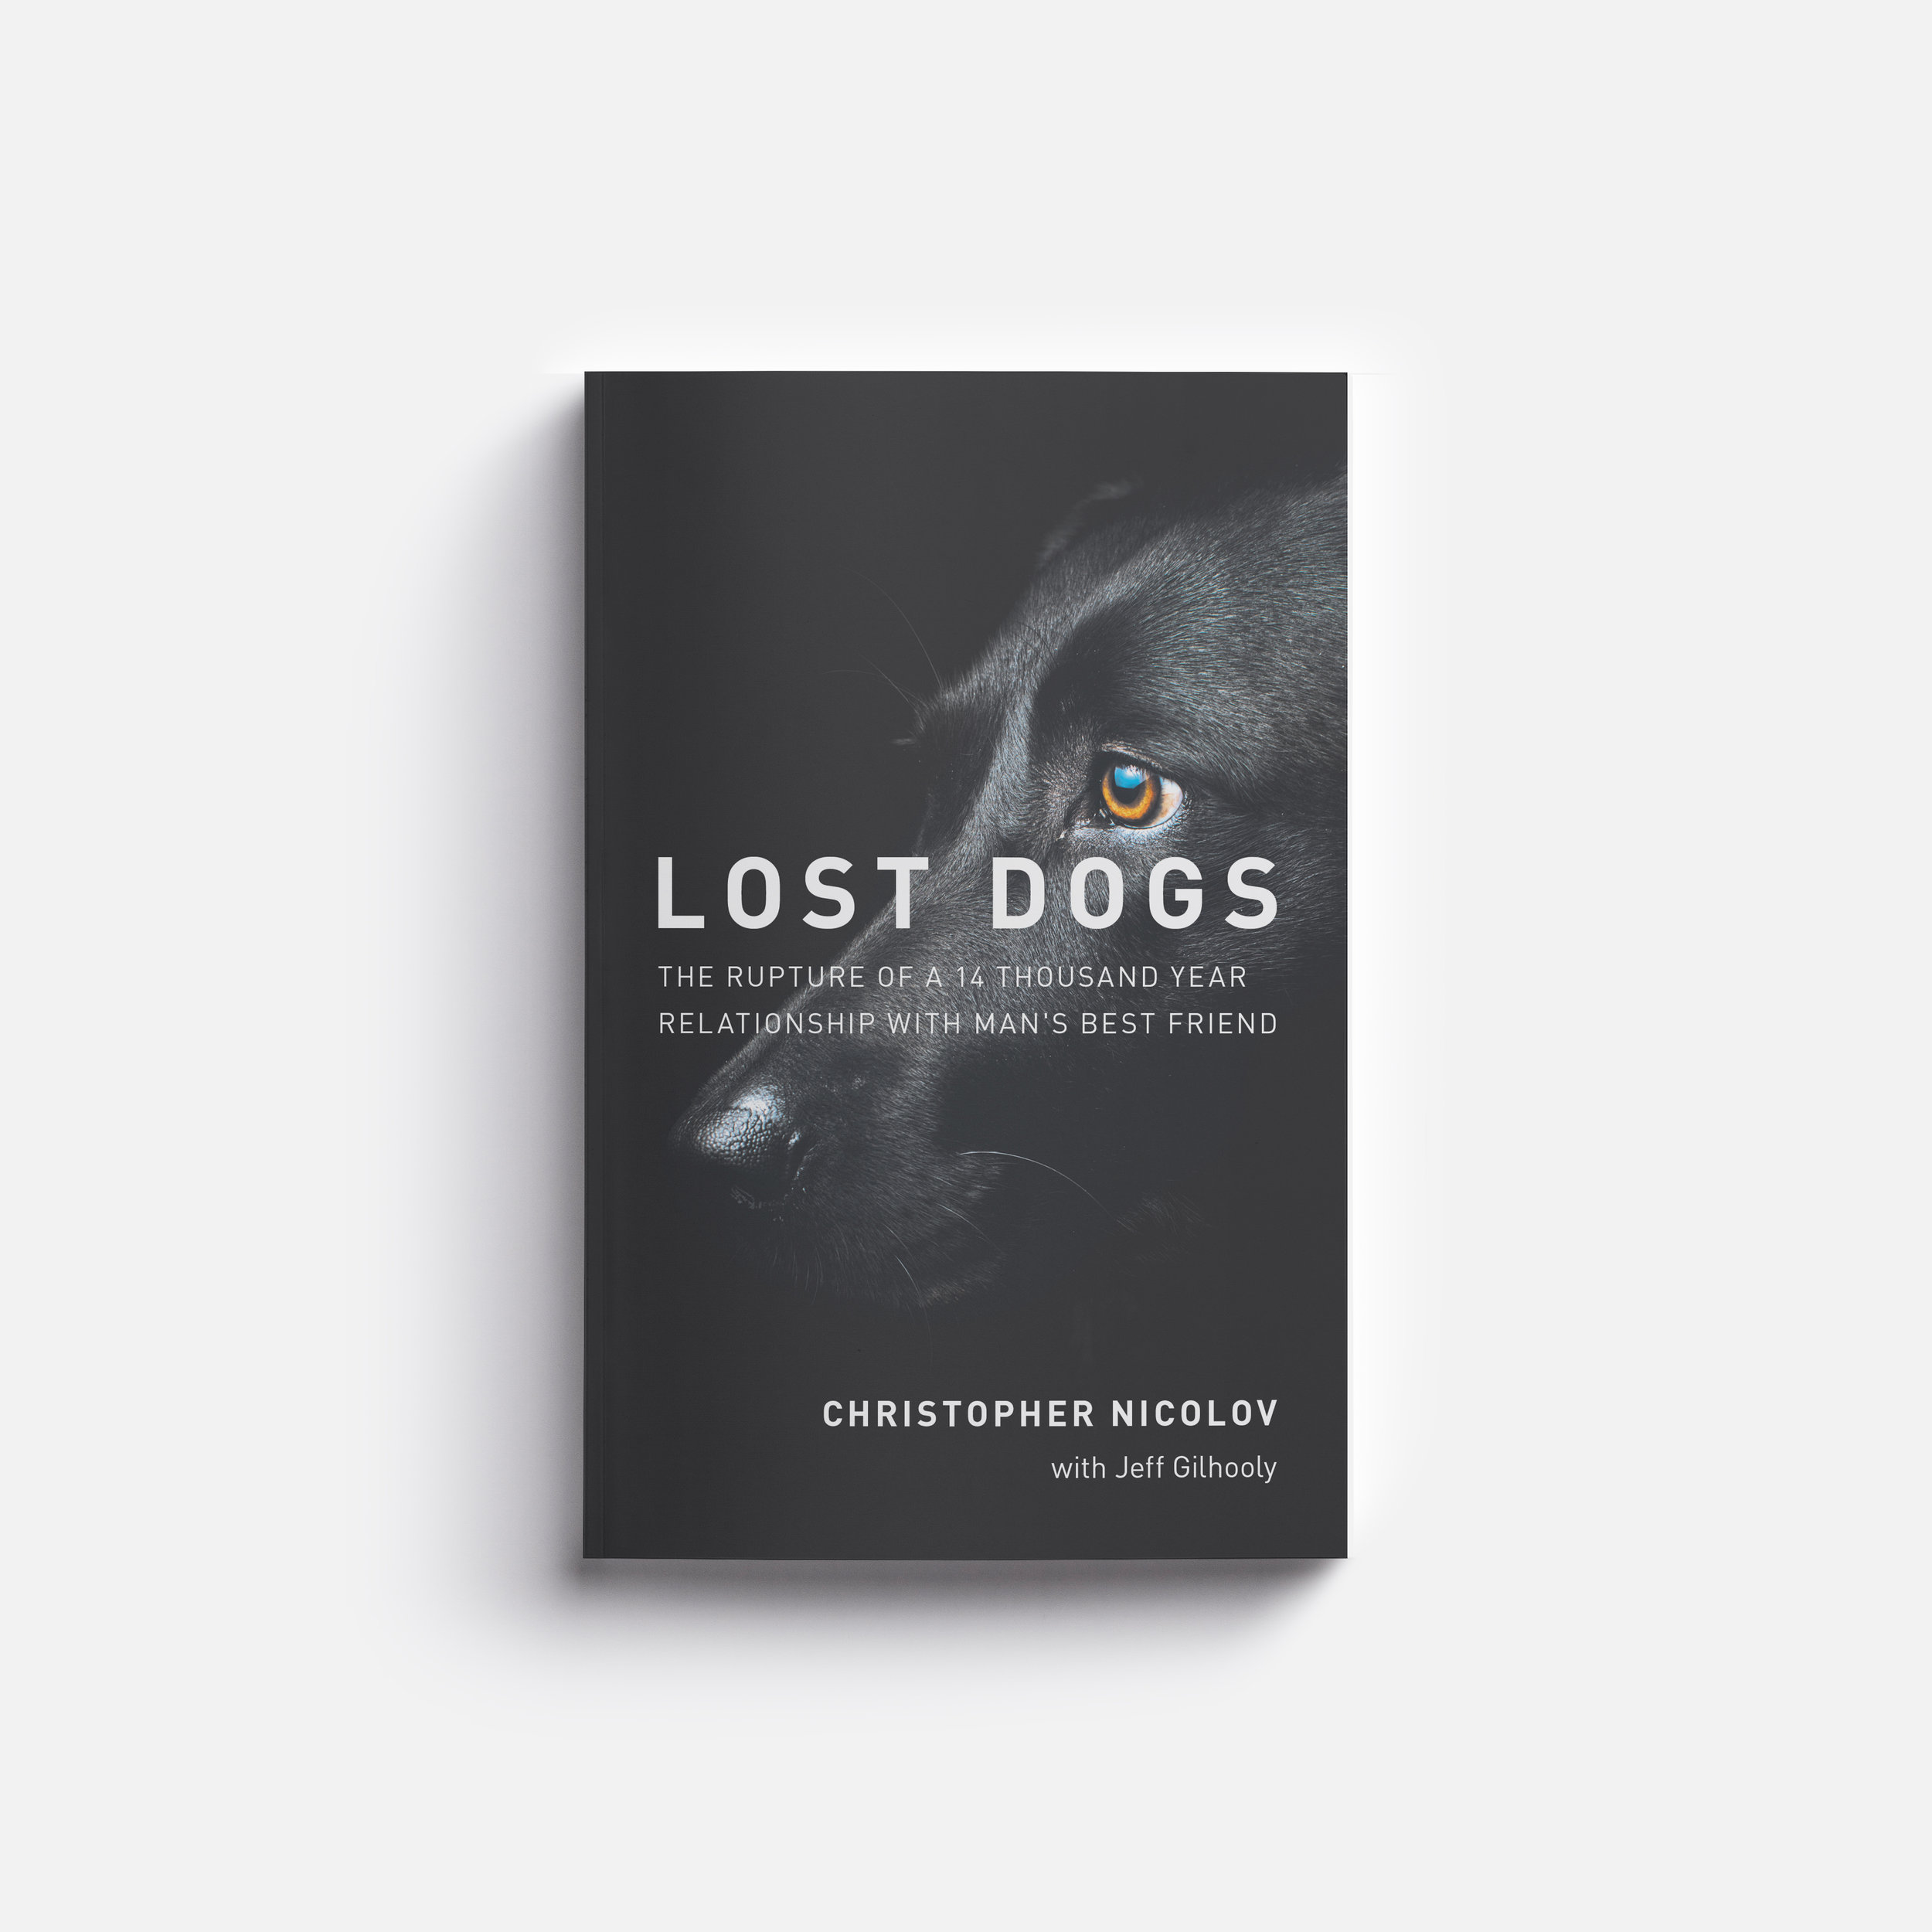 LostDogs_DahliaYuen.jpg